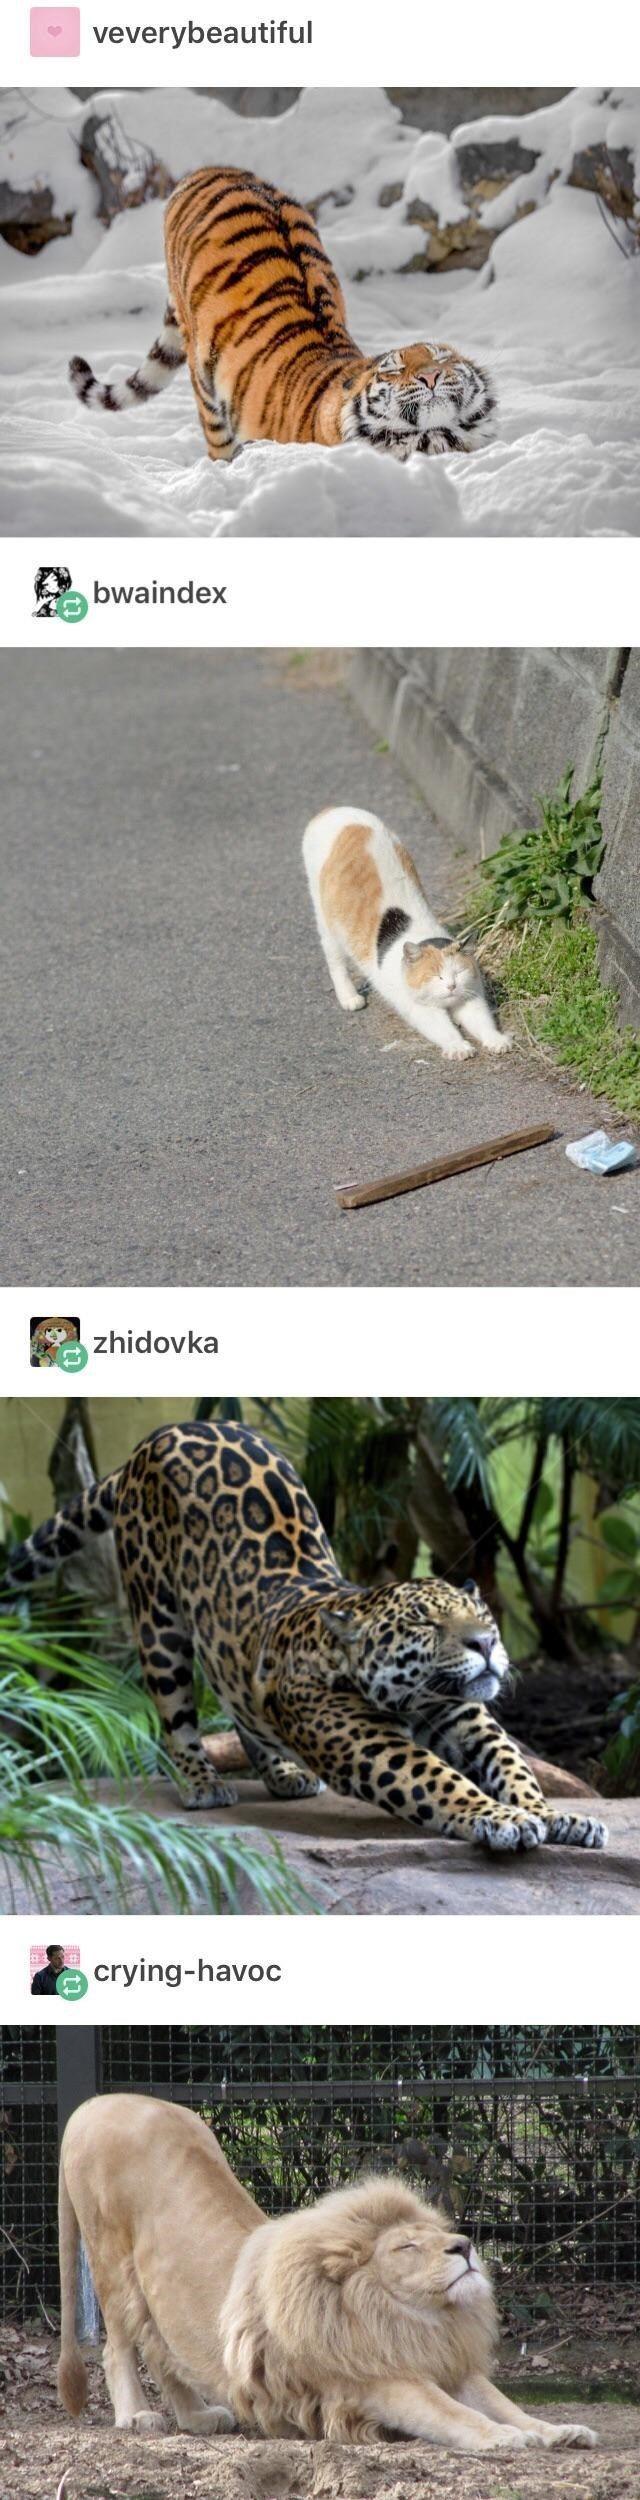 Streaching #animals # streaching # funny animals # big cats # animal photos